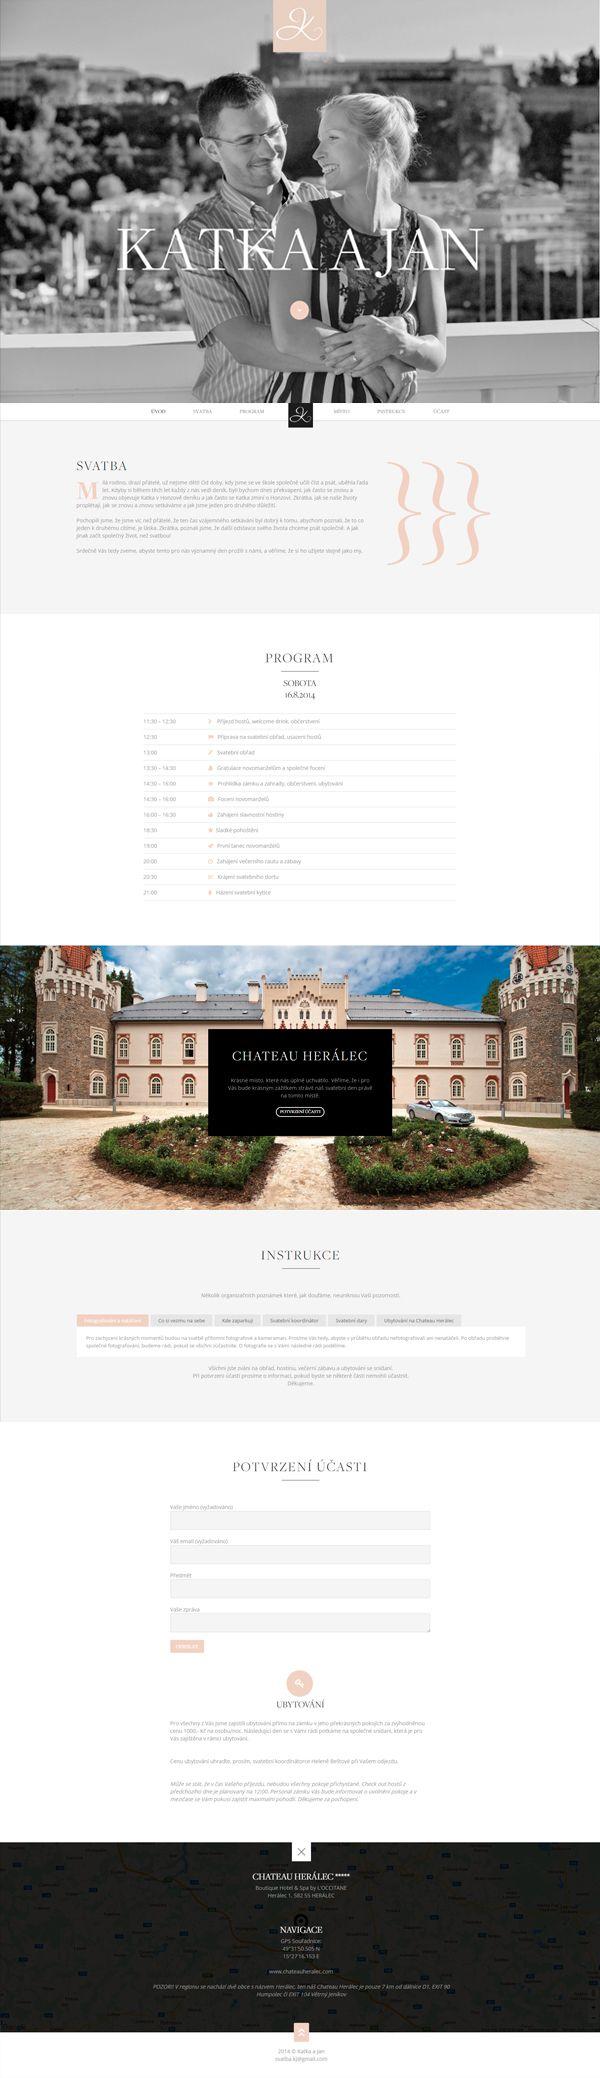 Jednoduchý a elegantní svatební web / Simple and elegant wedding site